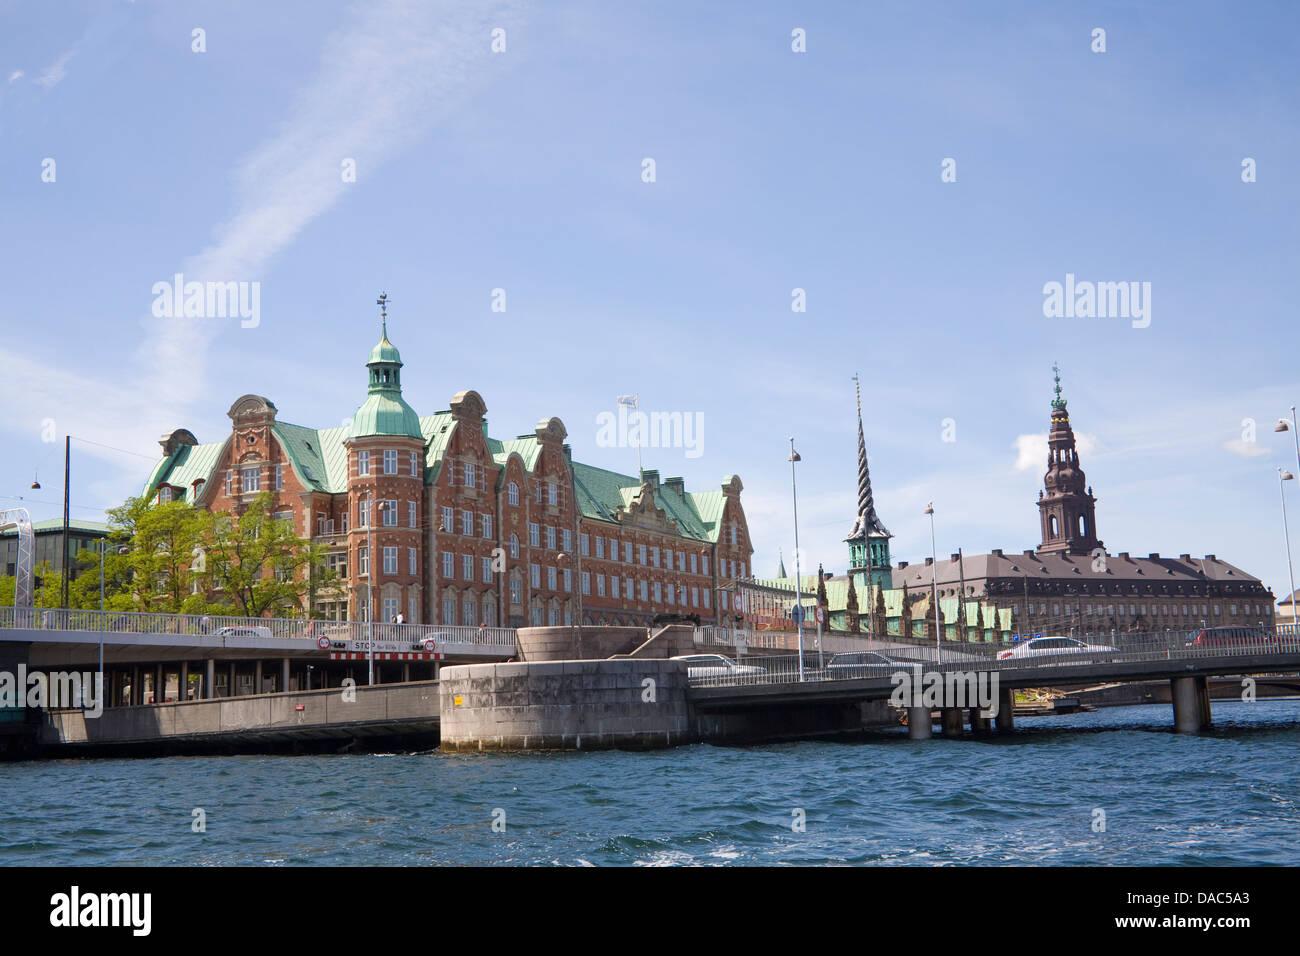 Copenhagen Denmark EU Approaching bridge over inner harbour with view of Old Stock Exchange Spiral tower Christiansborg - Stock Image